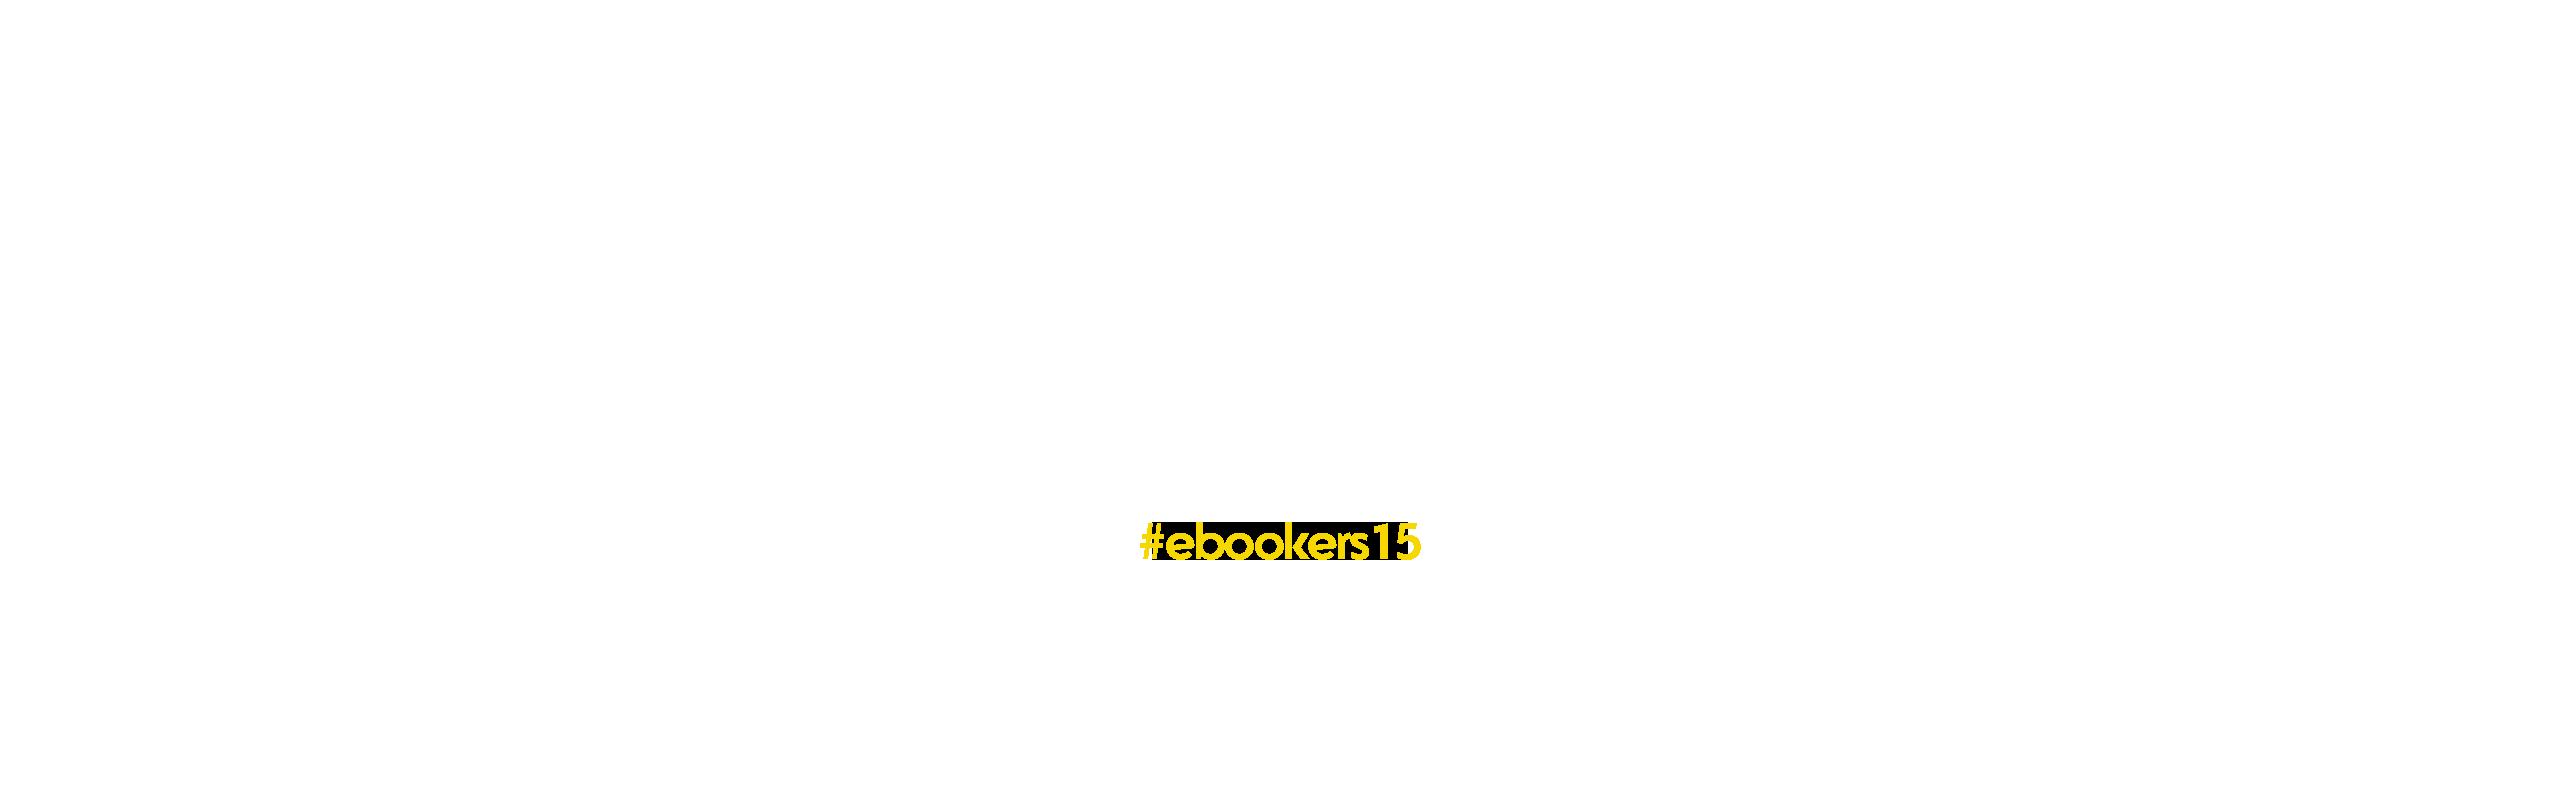 eBookers // 15yrs in Switzerland